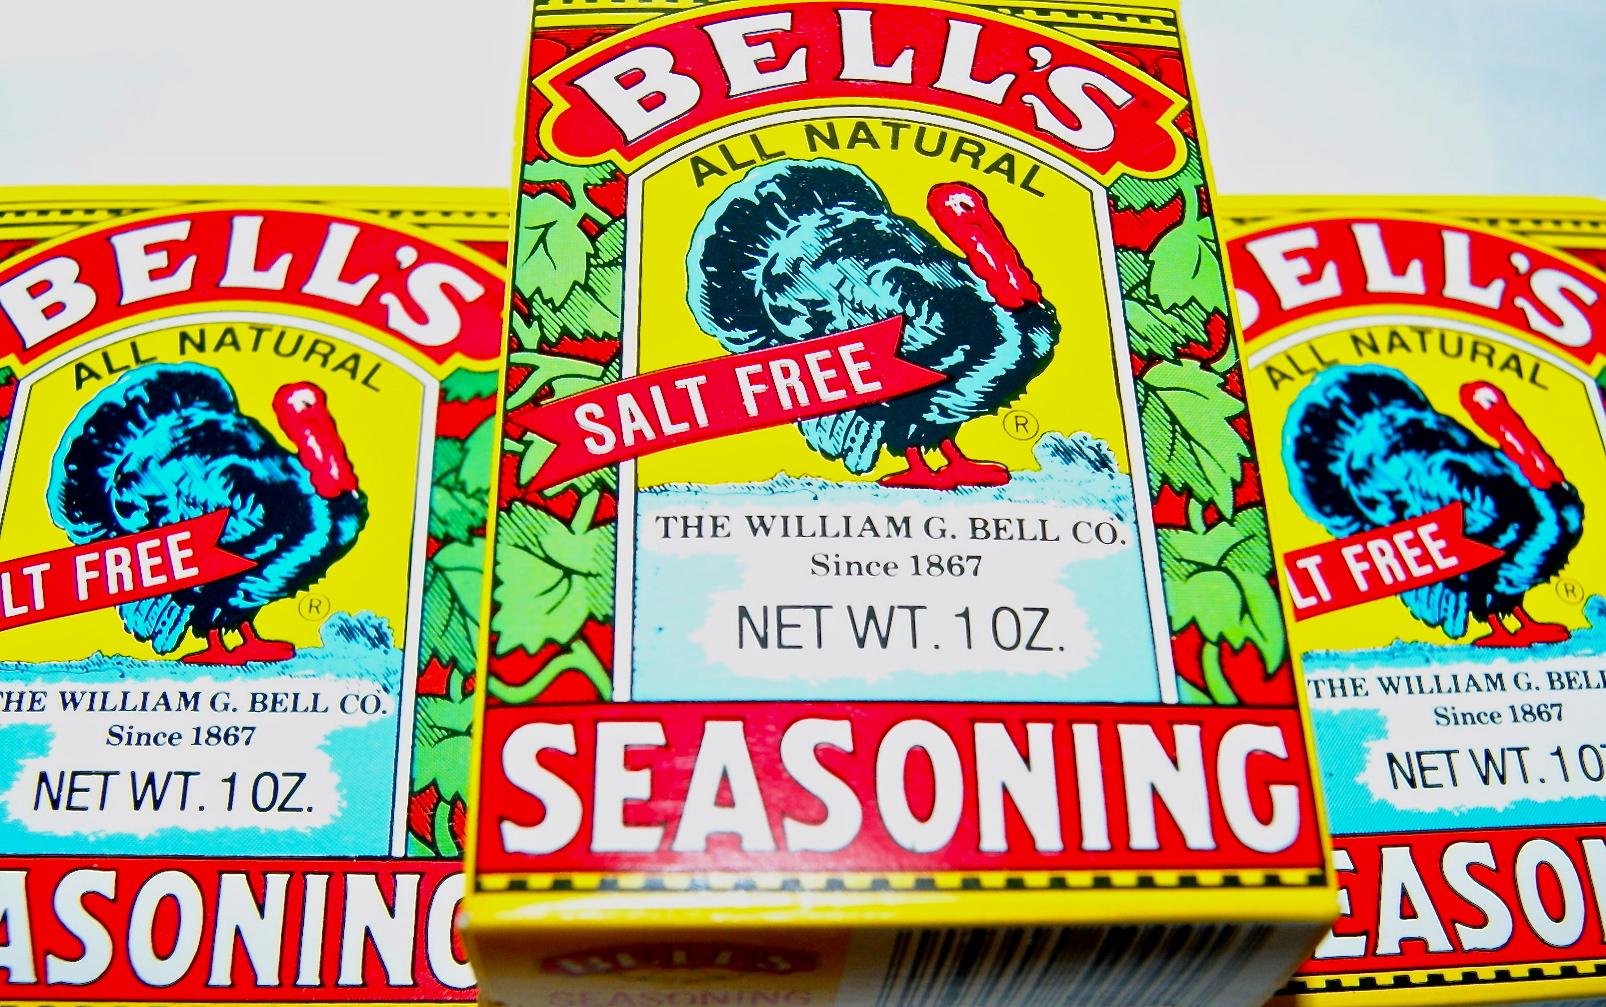 bells2.jpg